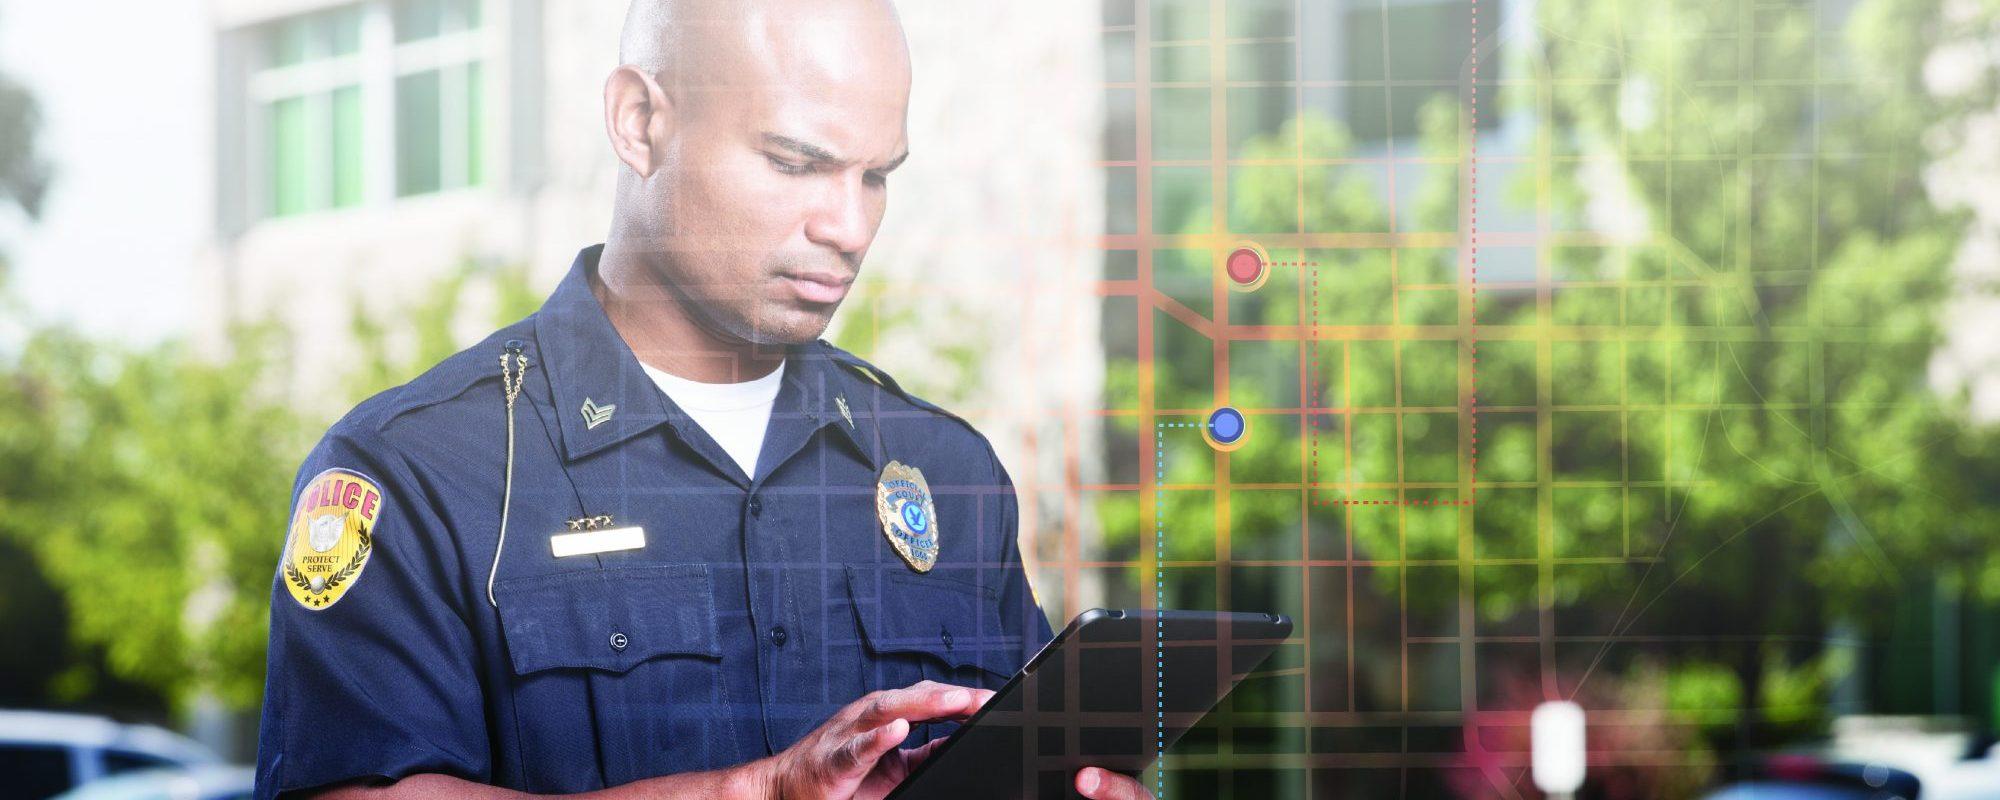 Public Safety cop using AVL